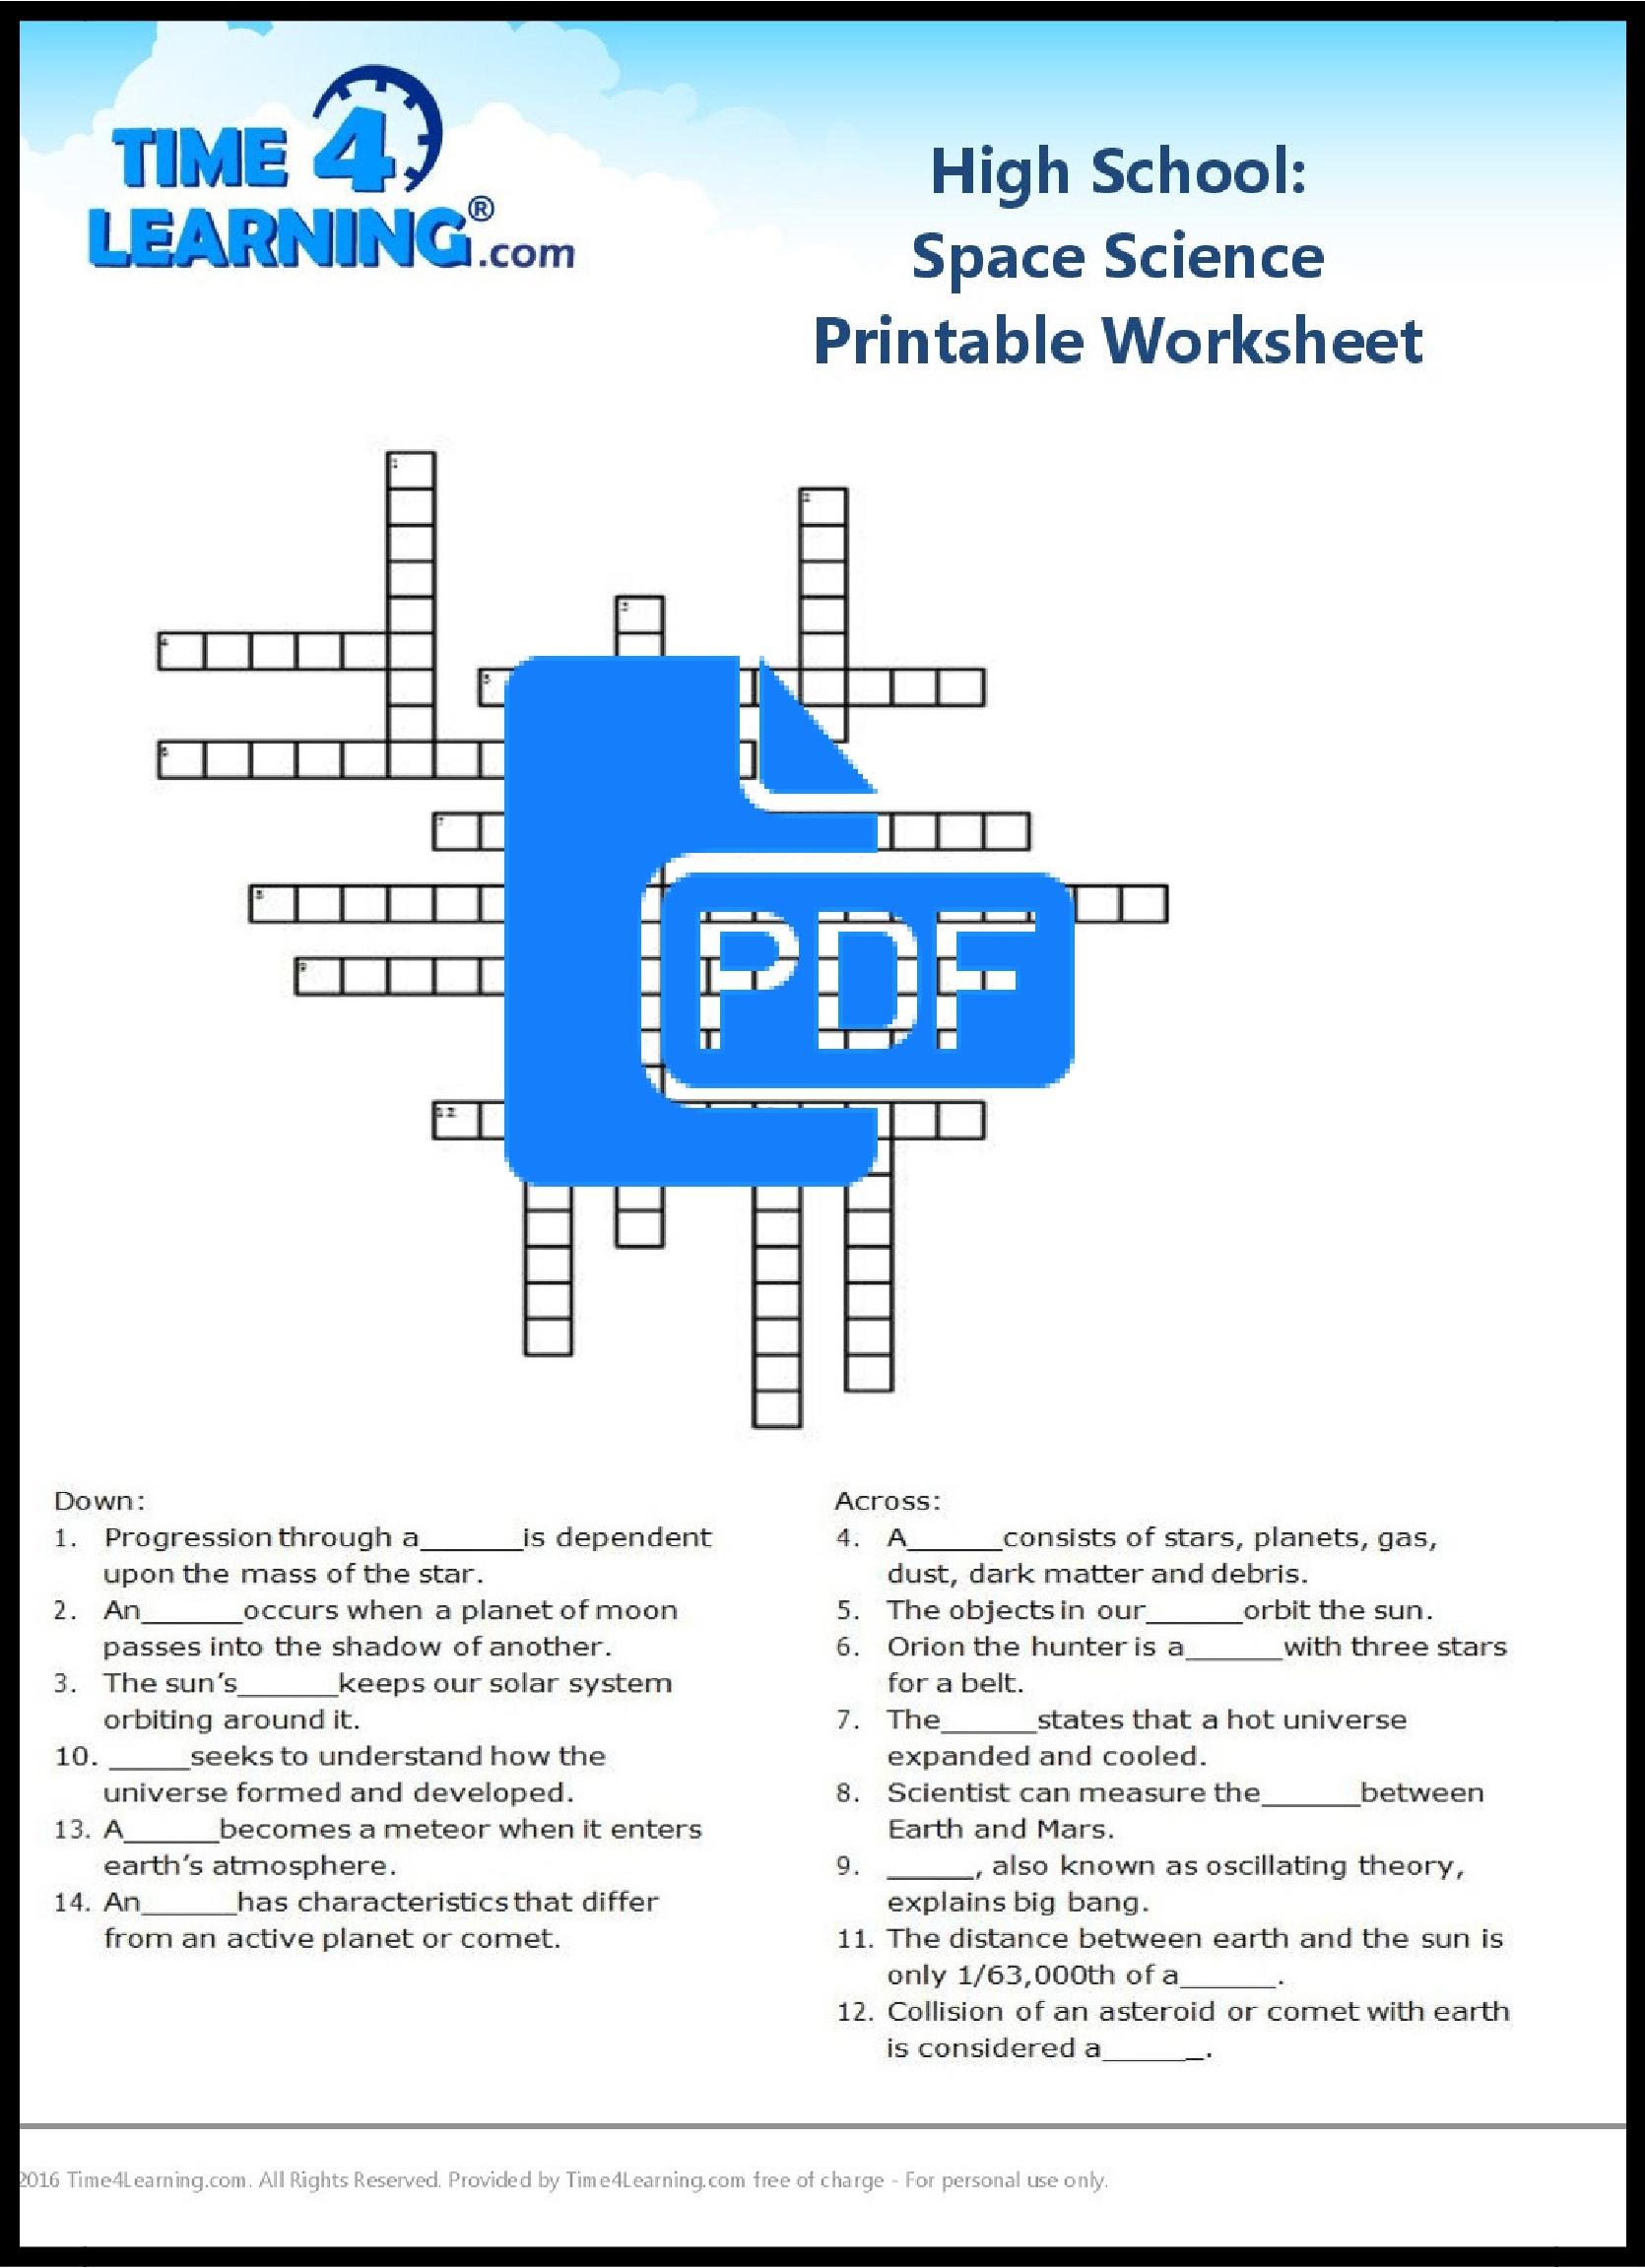 Free Printable: High School Space Science Worksheet   Time4Learning   Printable Science Worksheets